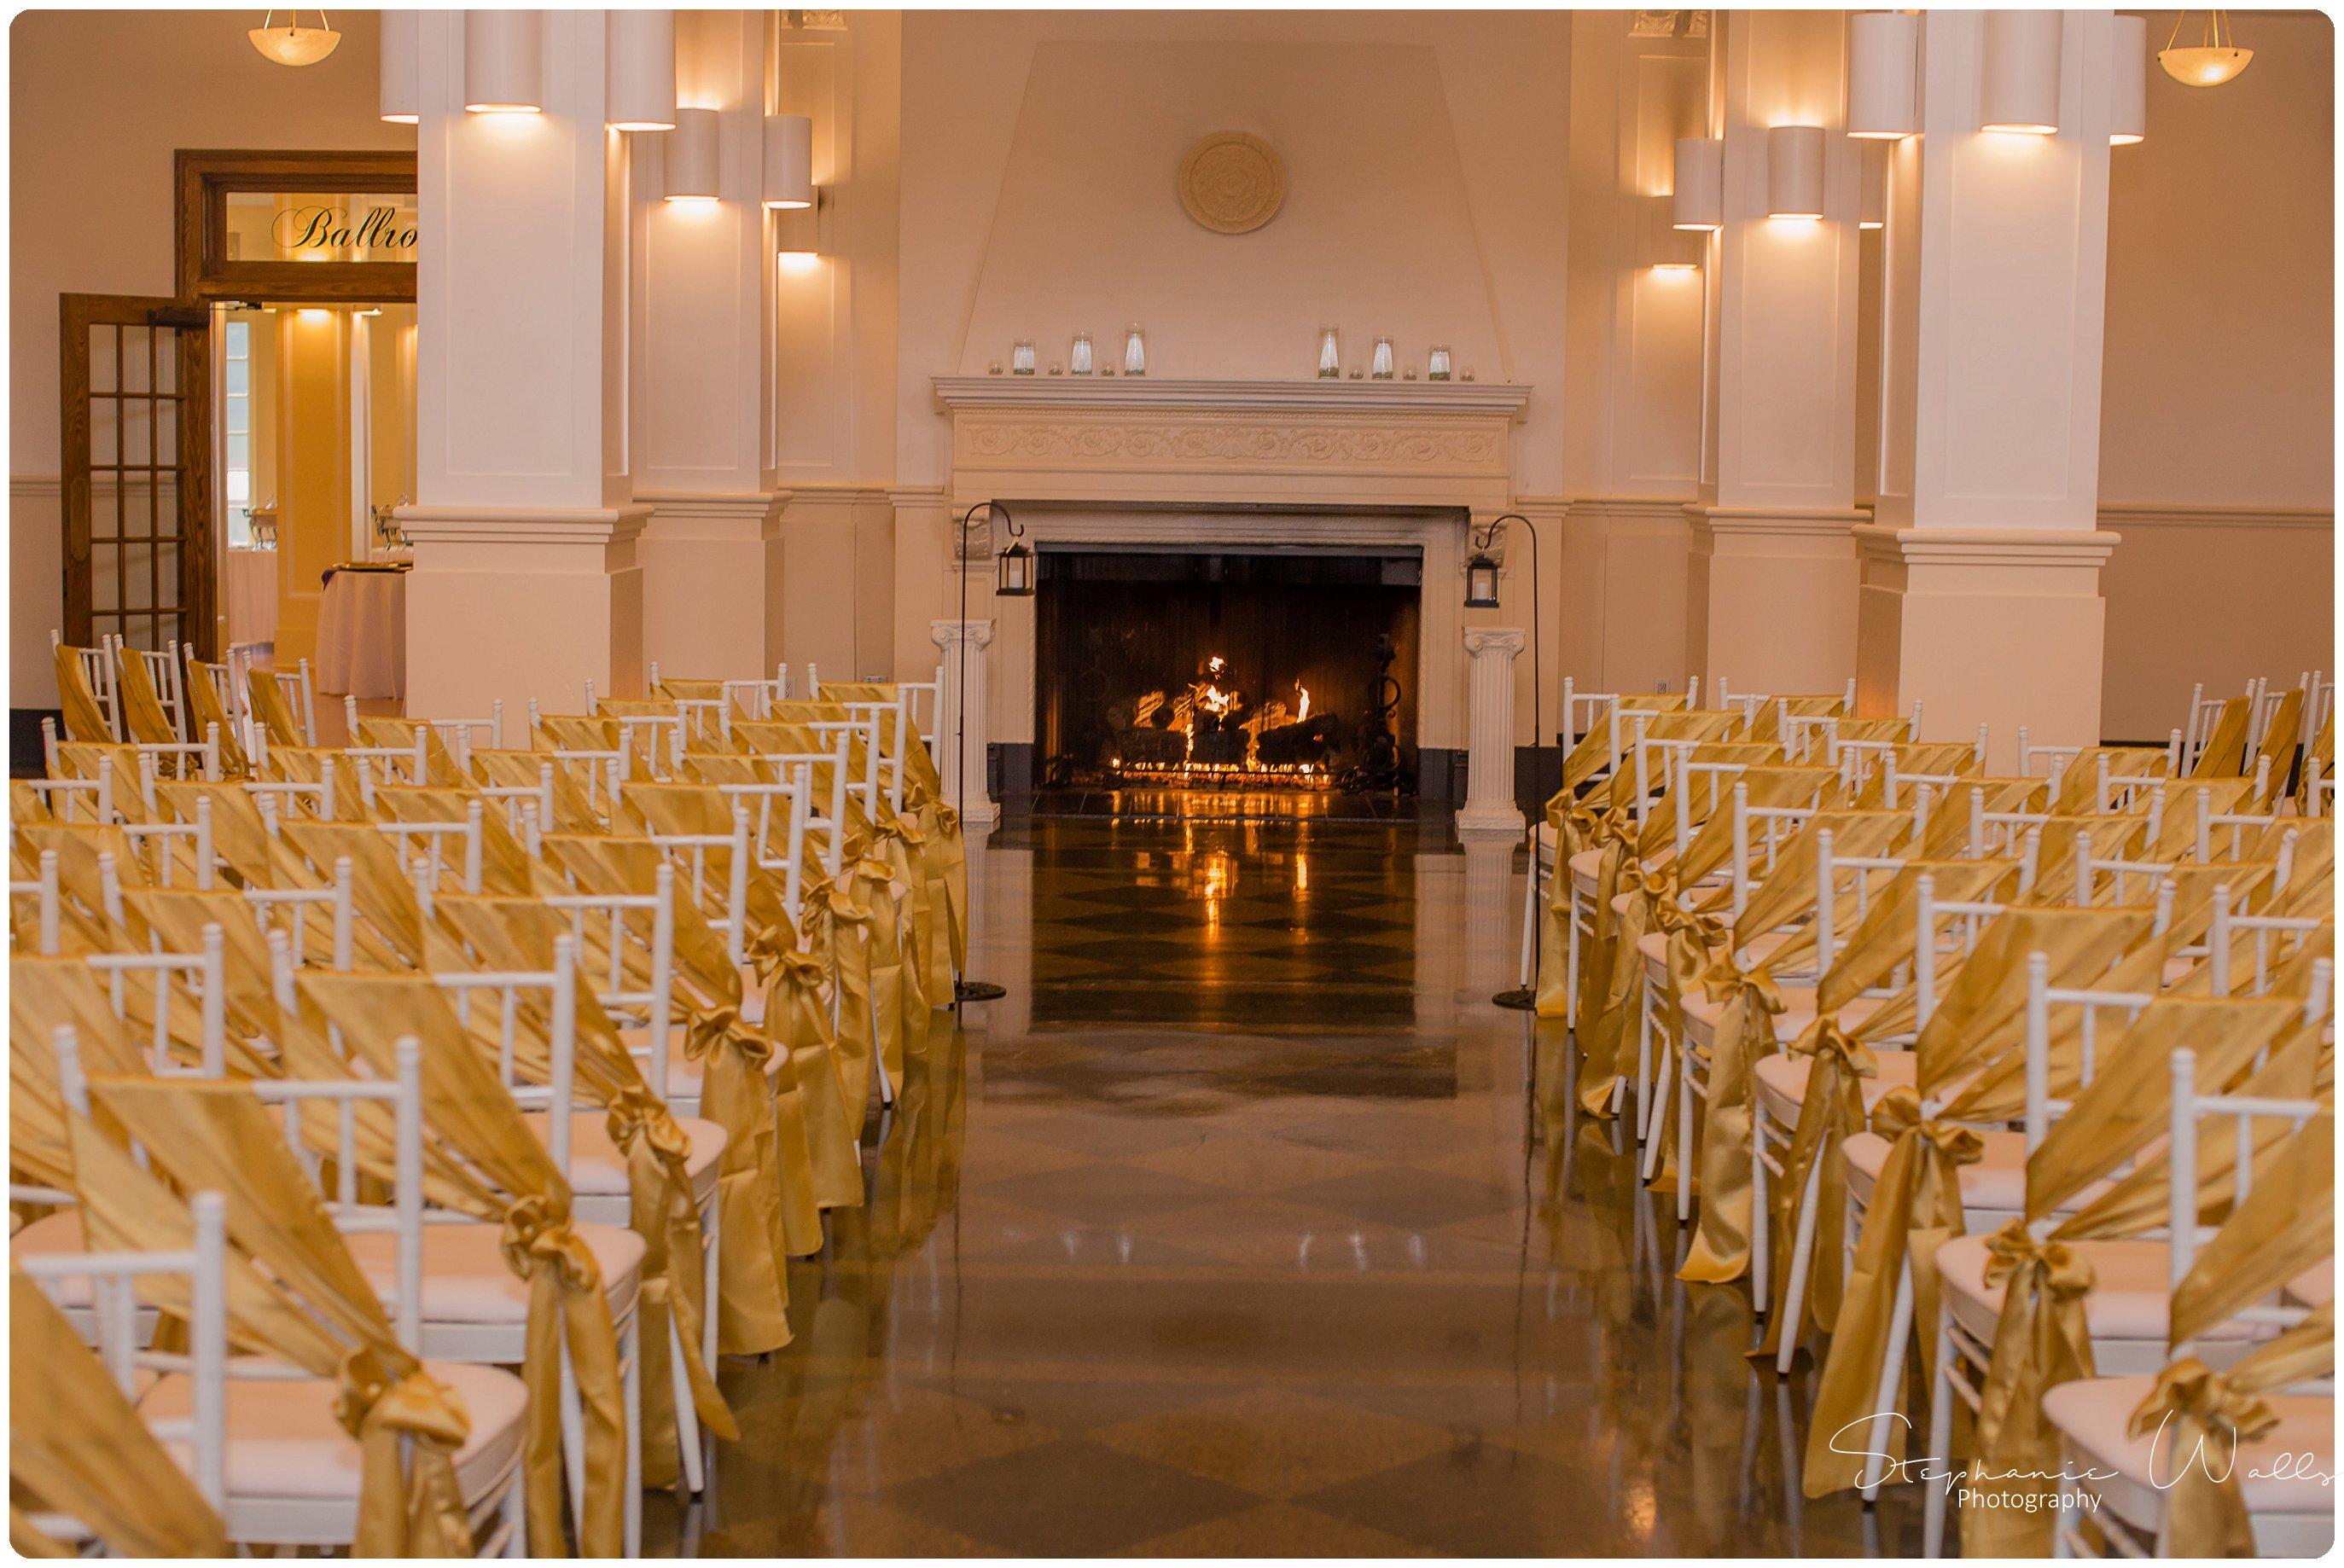 Sears Details 001 The Hero & The Starlet | Monte Cristo Ballroom | Stephanie Walls Photography Weddings